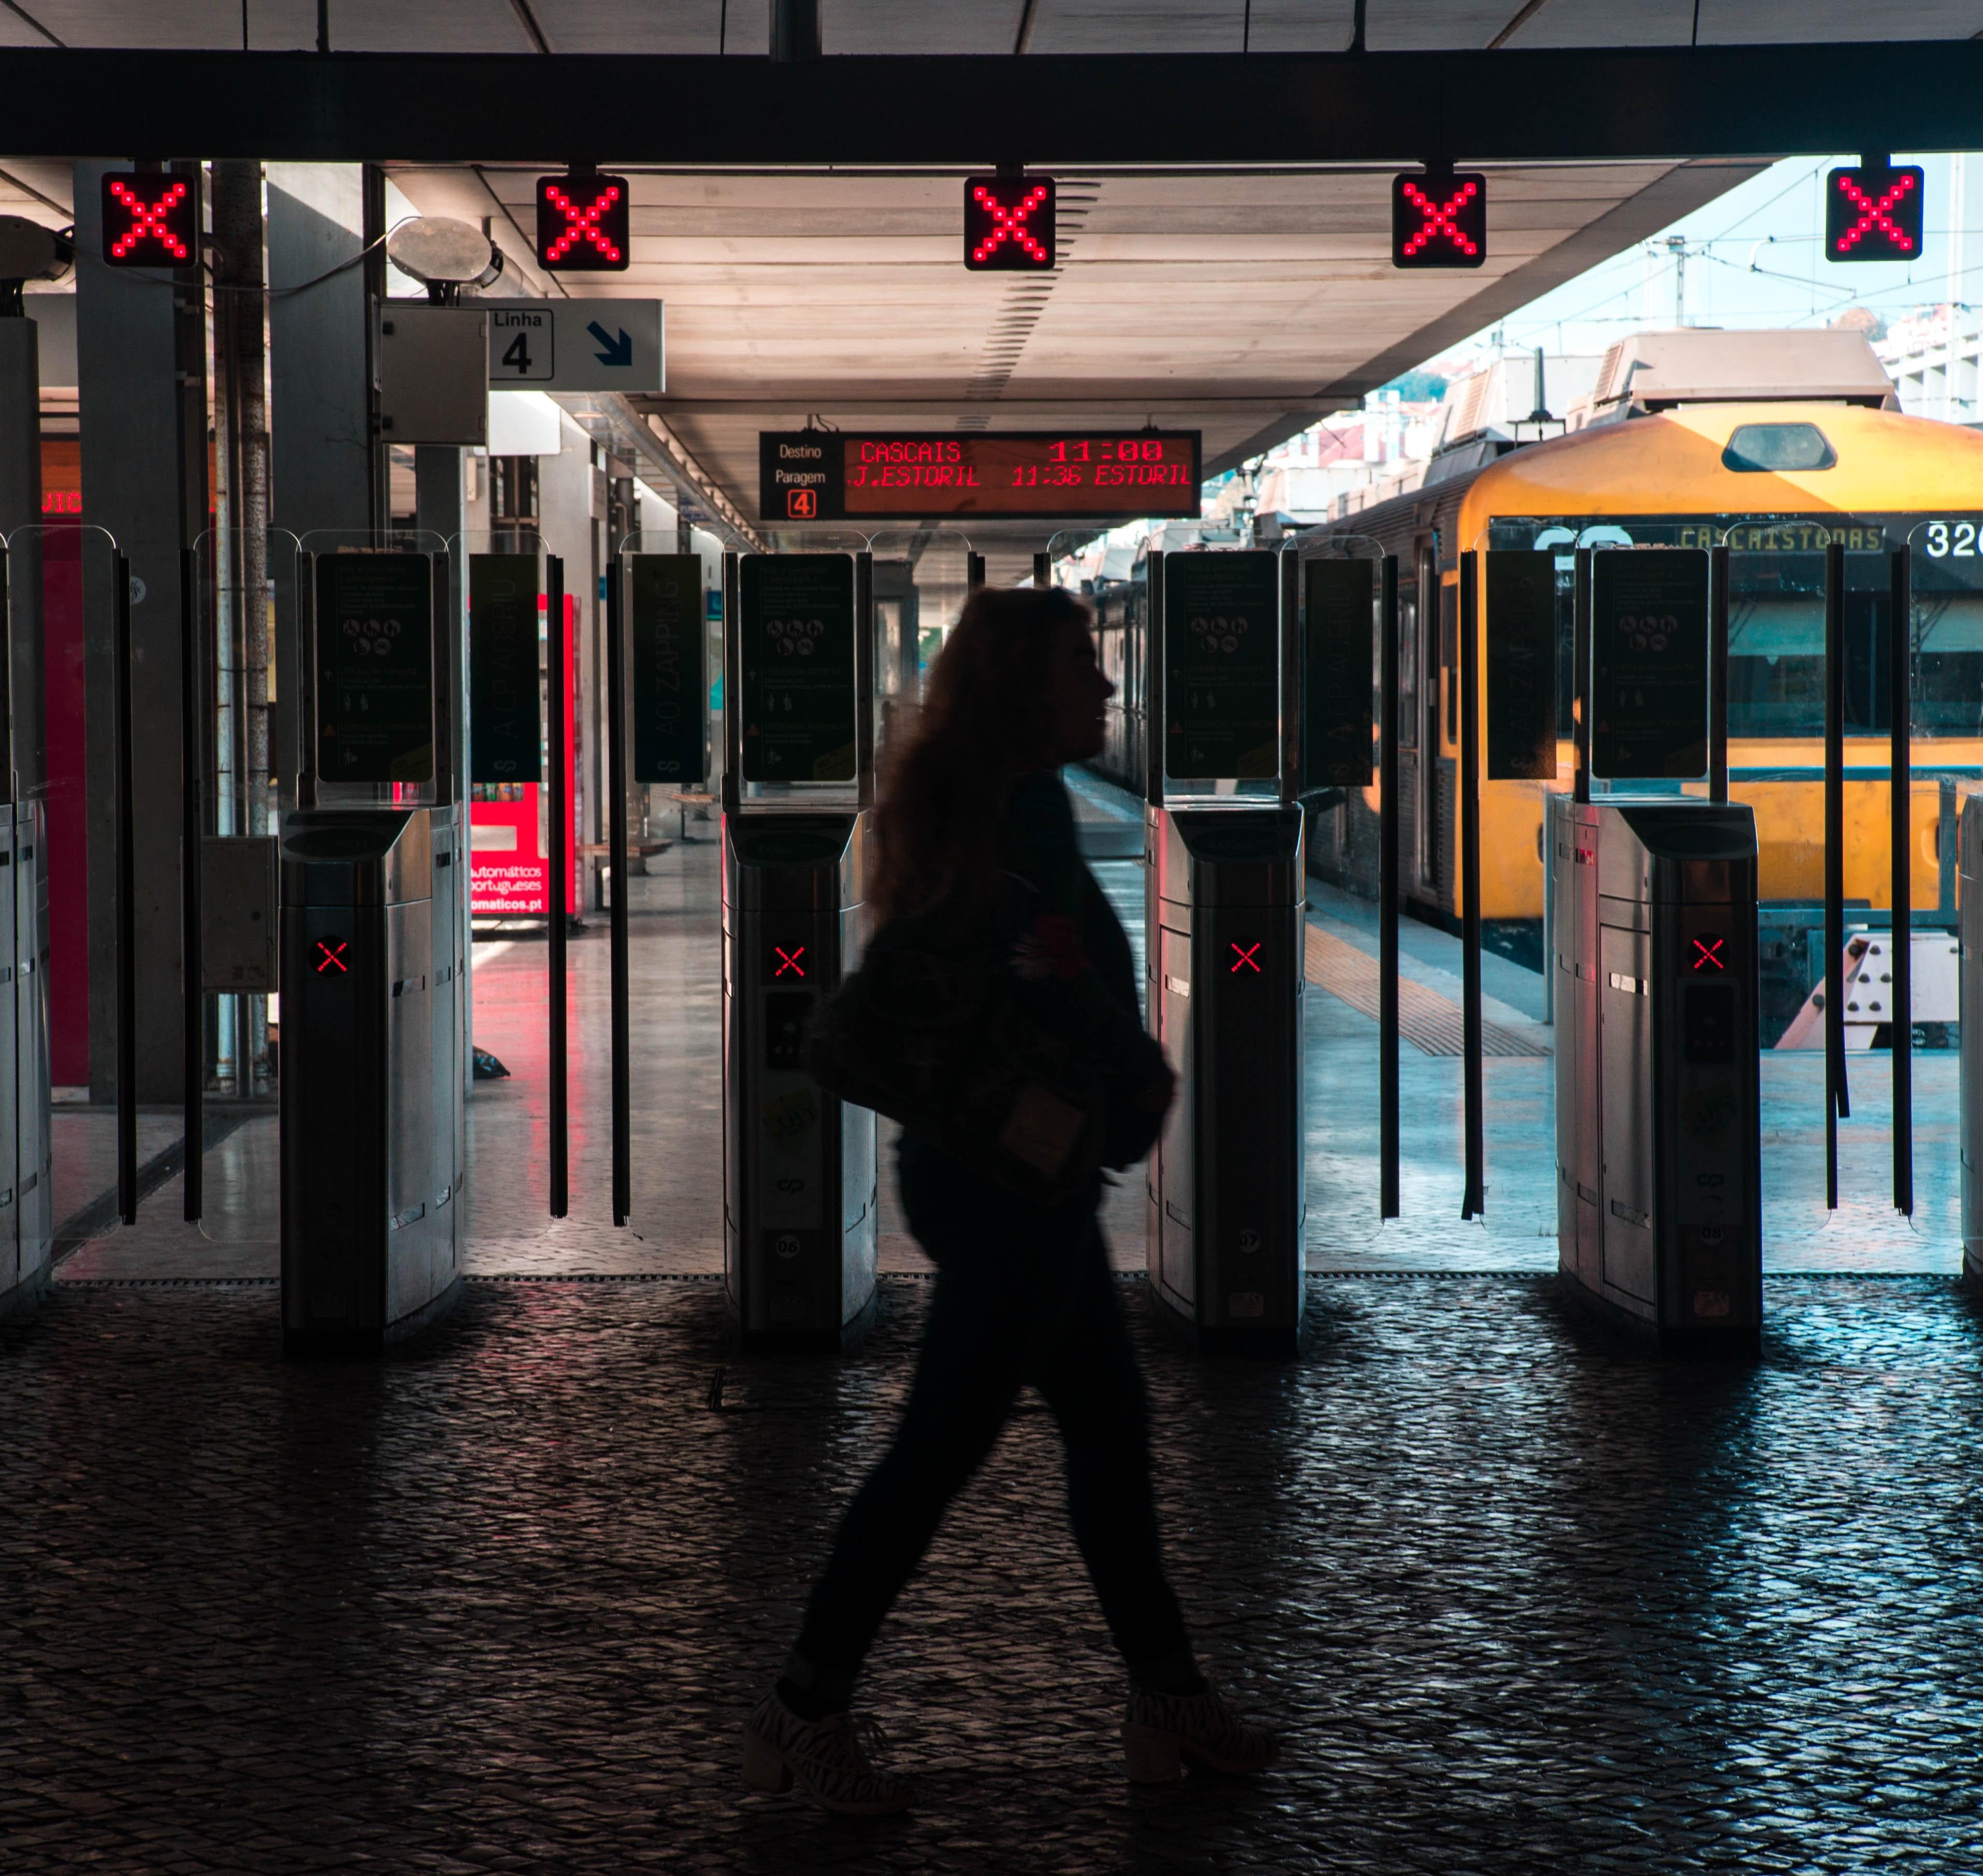 Photo by Valentin Antonini on Unsplash